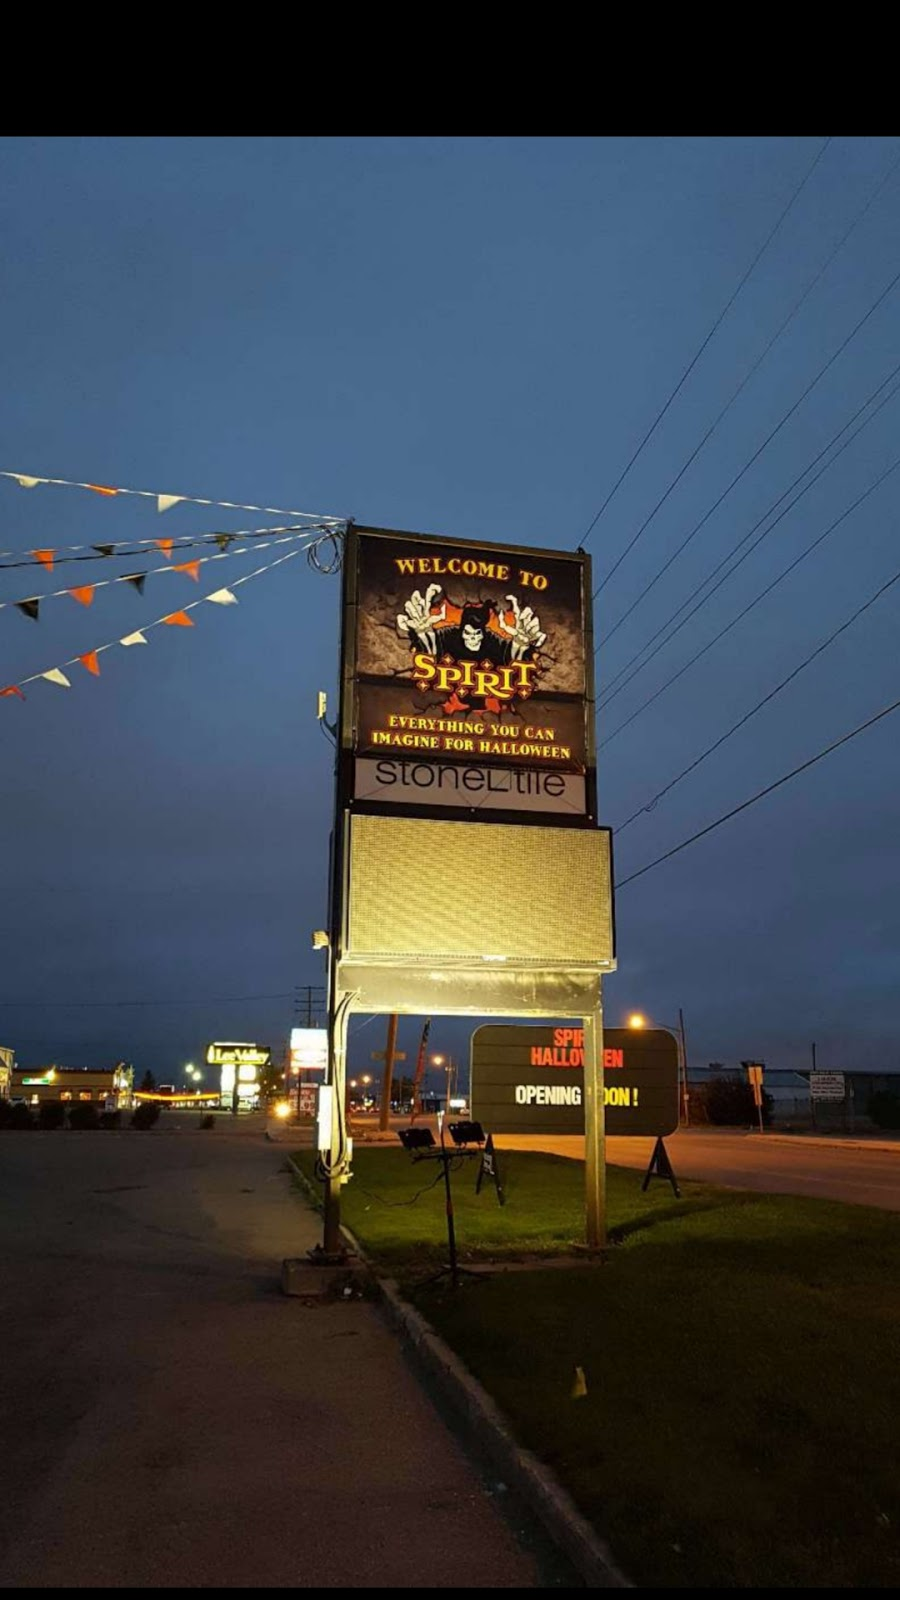 Spirit Halloween   clothing store   710 51st St, Saskatoon, SK S7K 4K4, Canada   3069348056 OR +1 306-934-8056